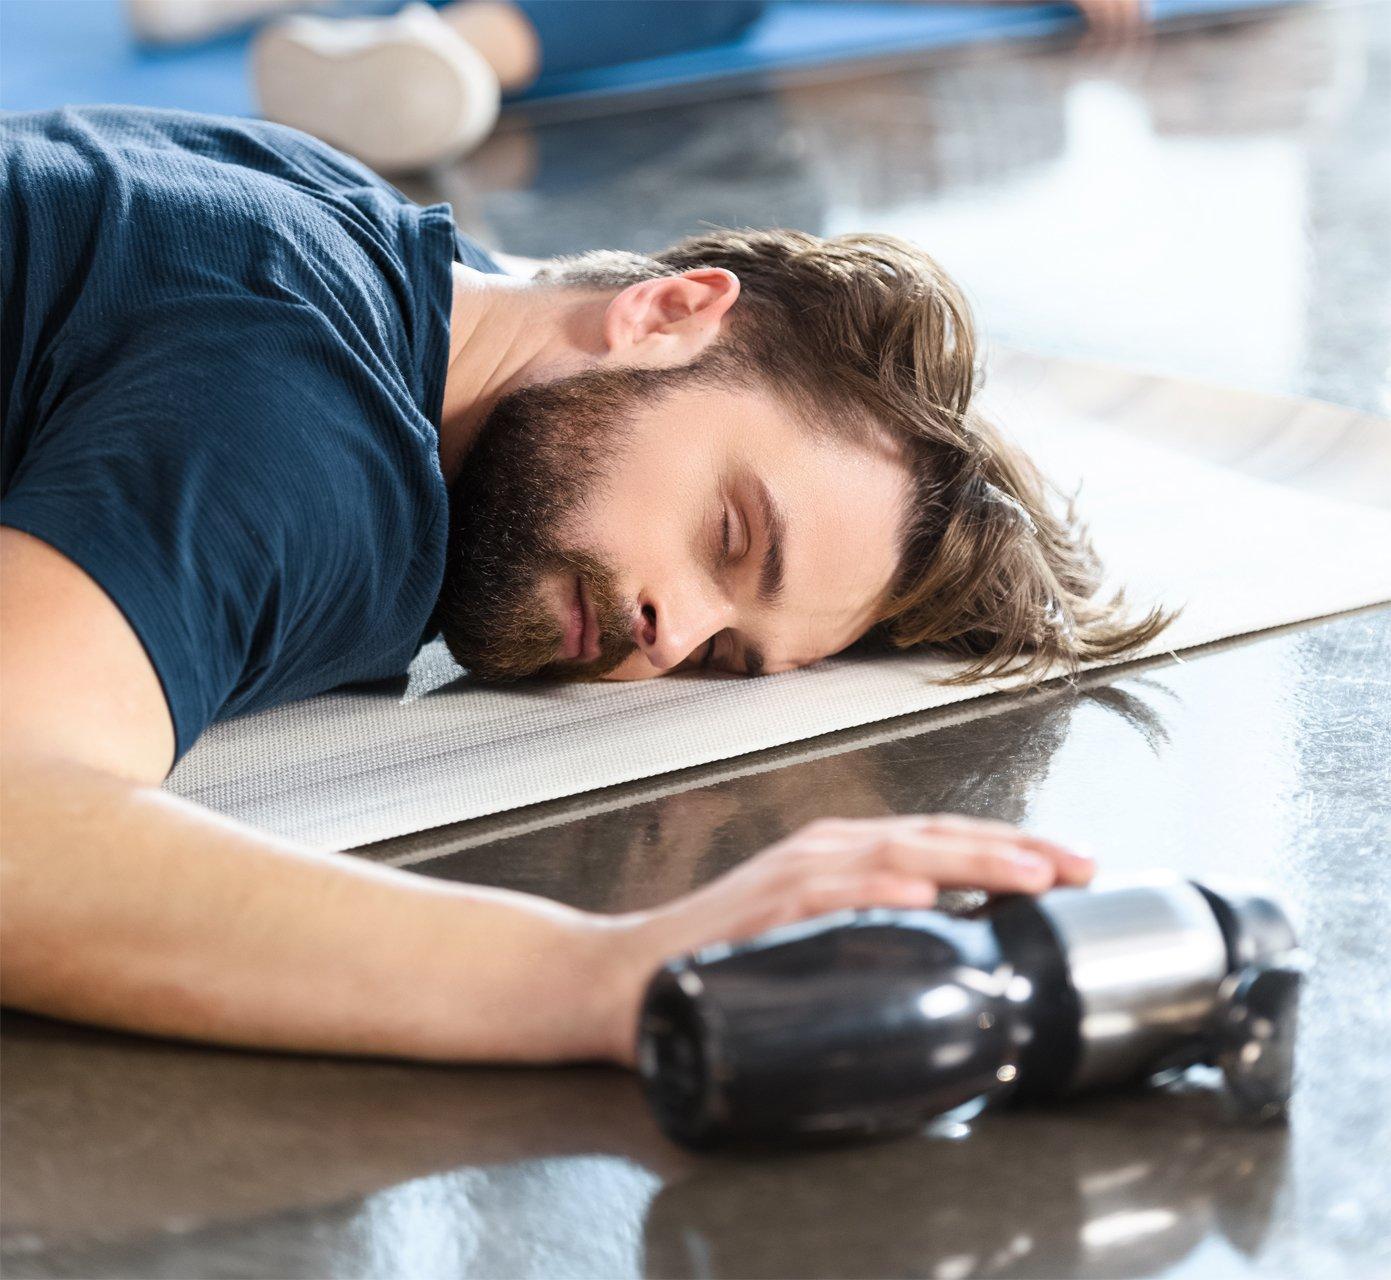 Athlete very sleepy on the ground, due to sleep apnea